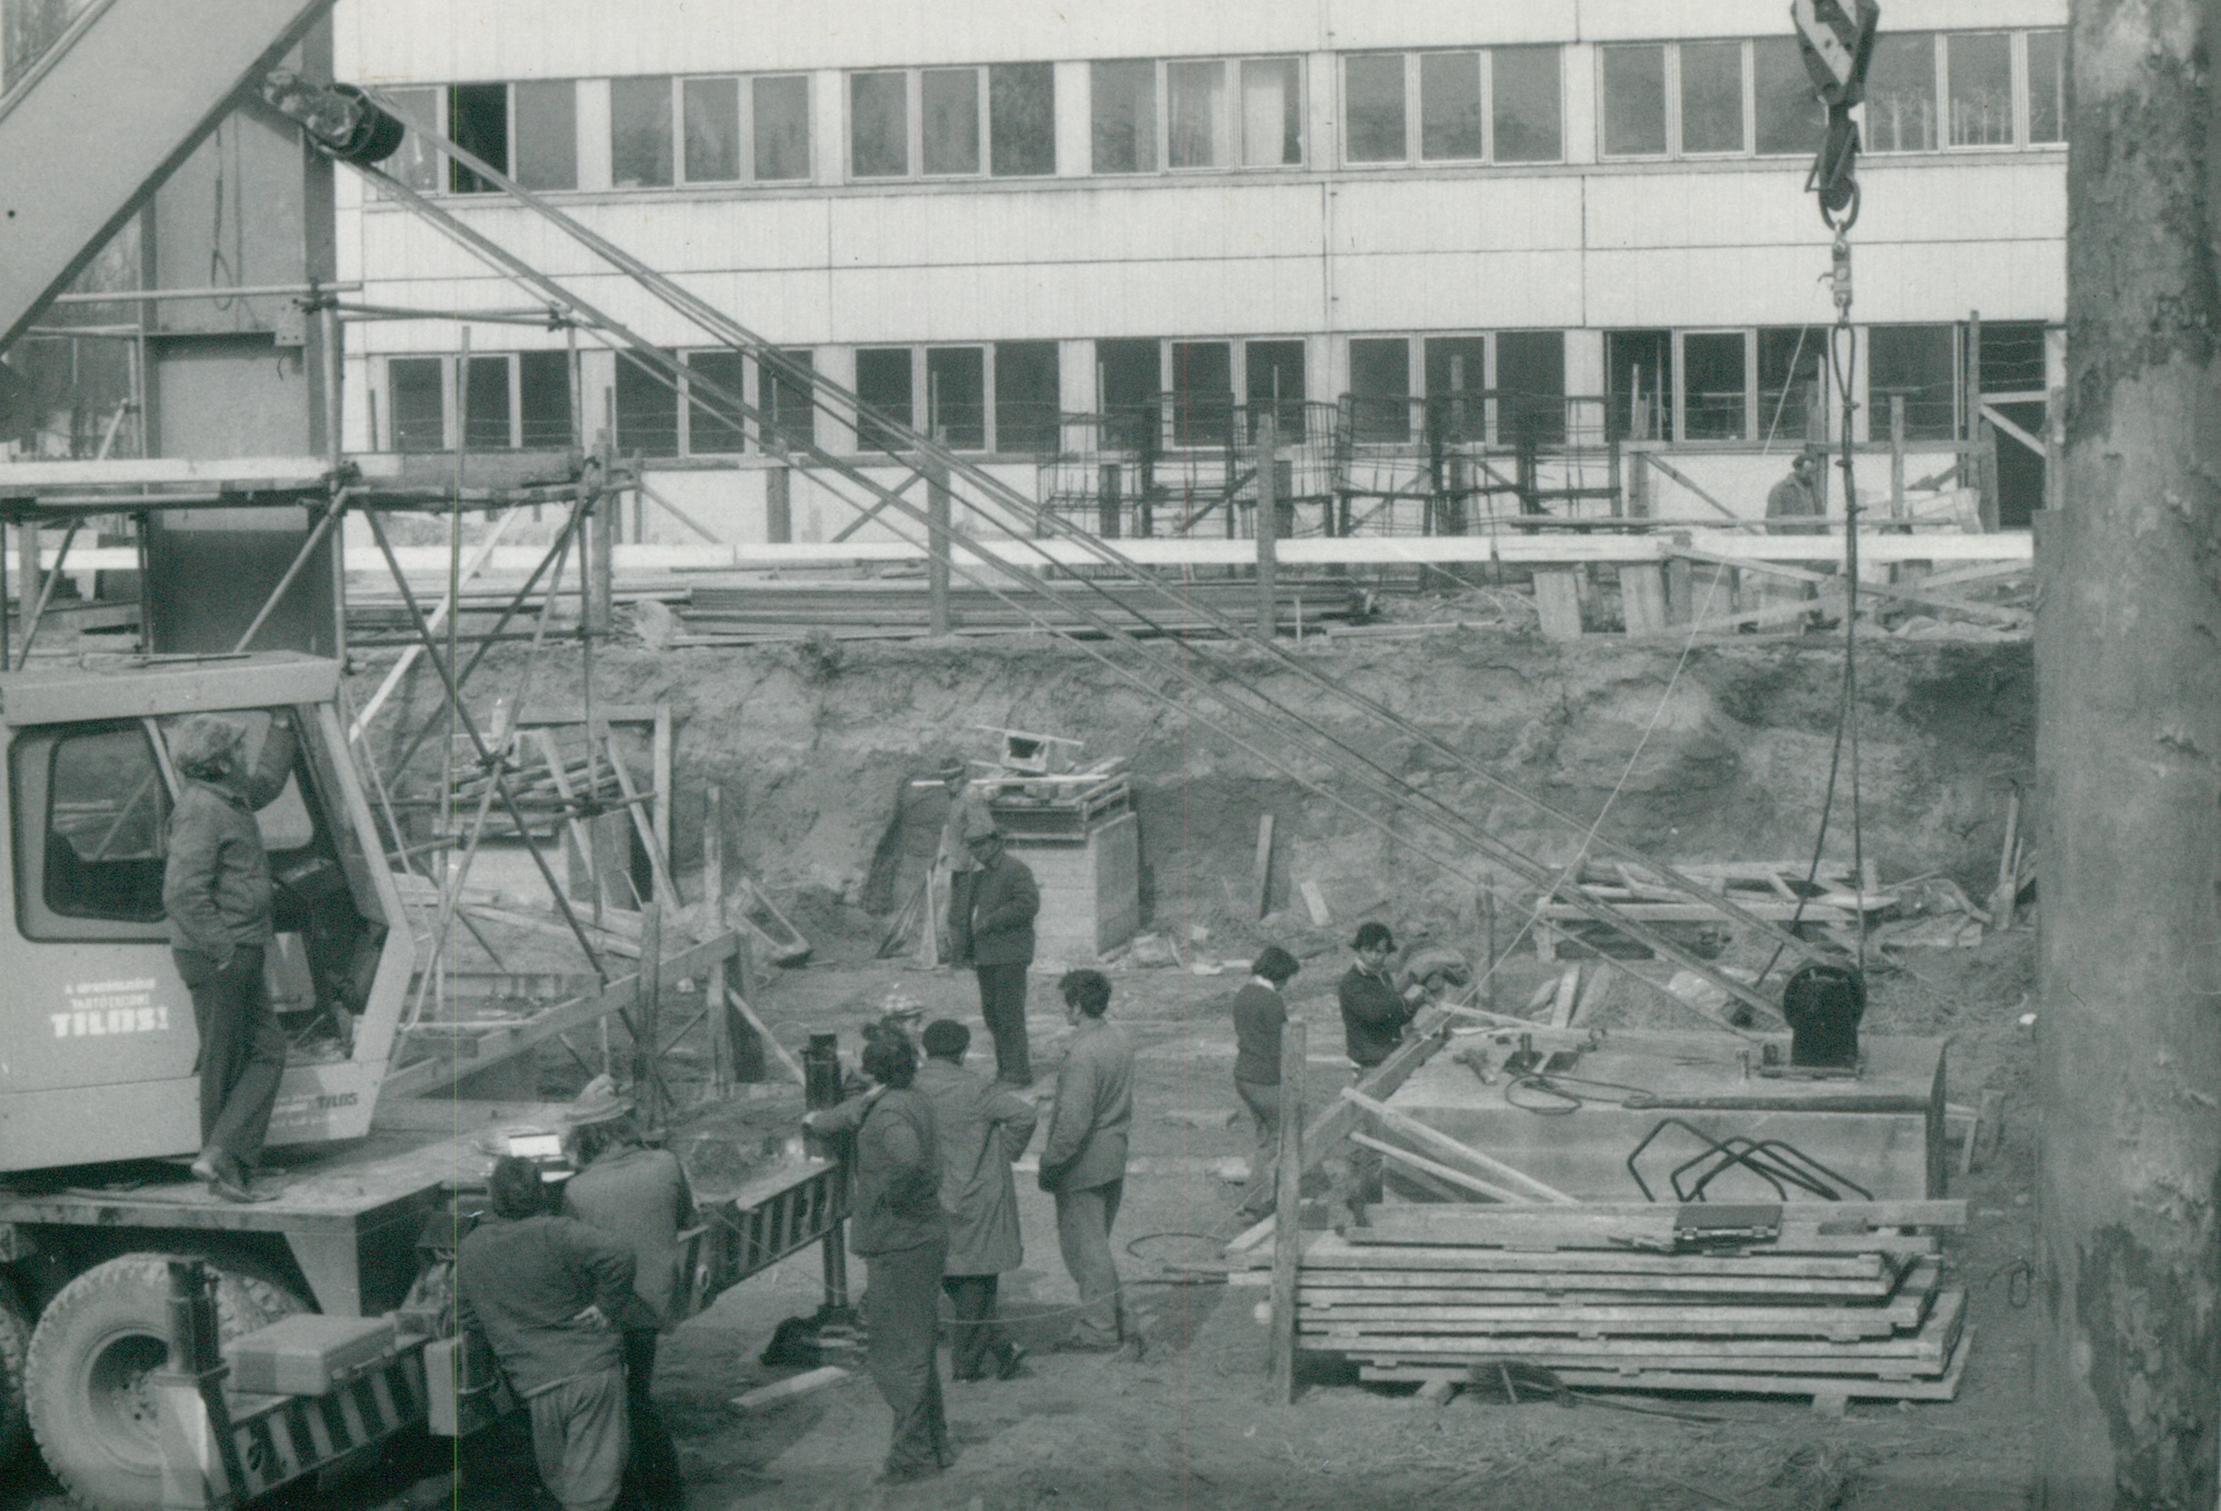 A debreceni DMTE sportcsarnok alapozása